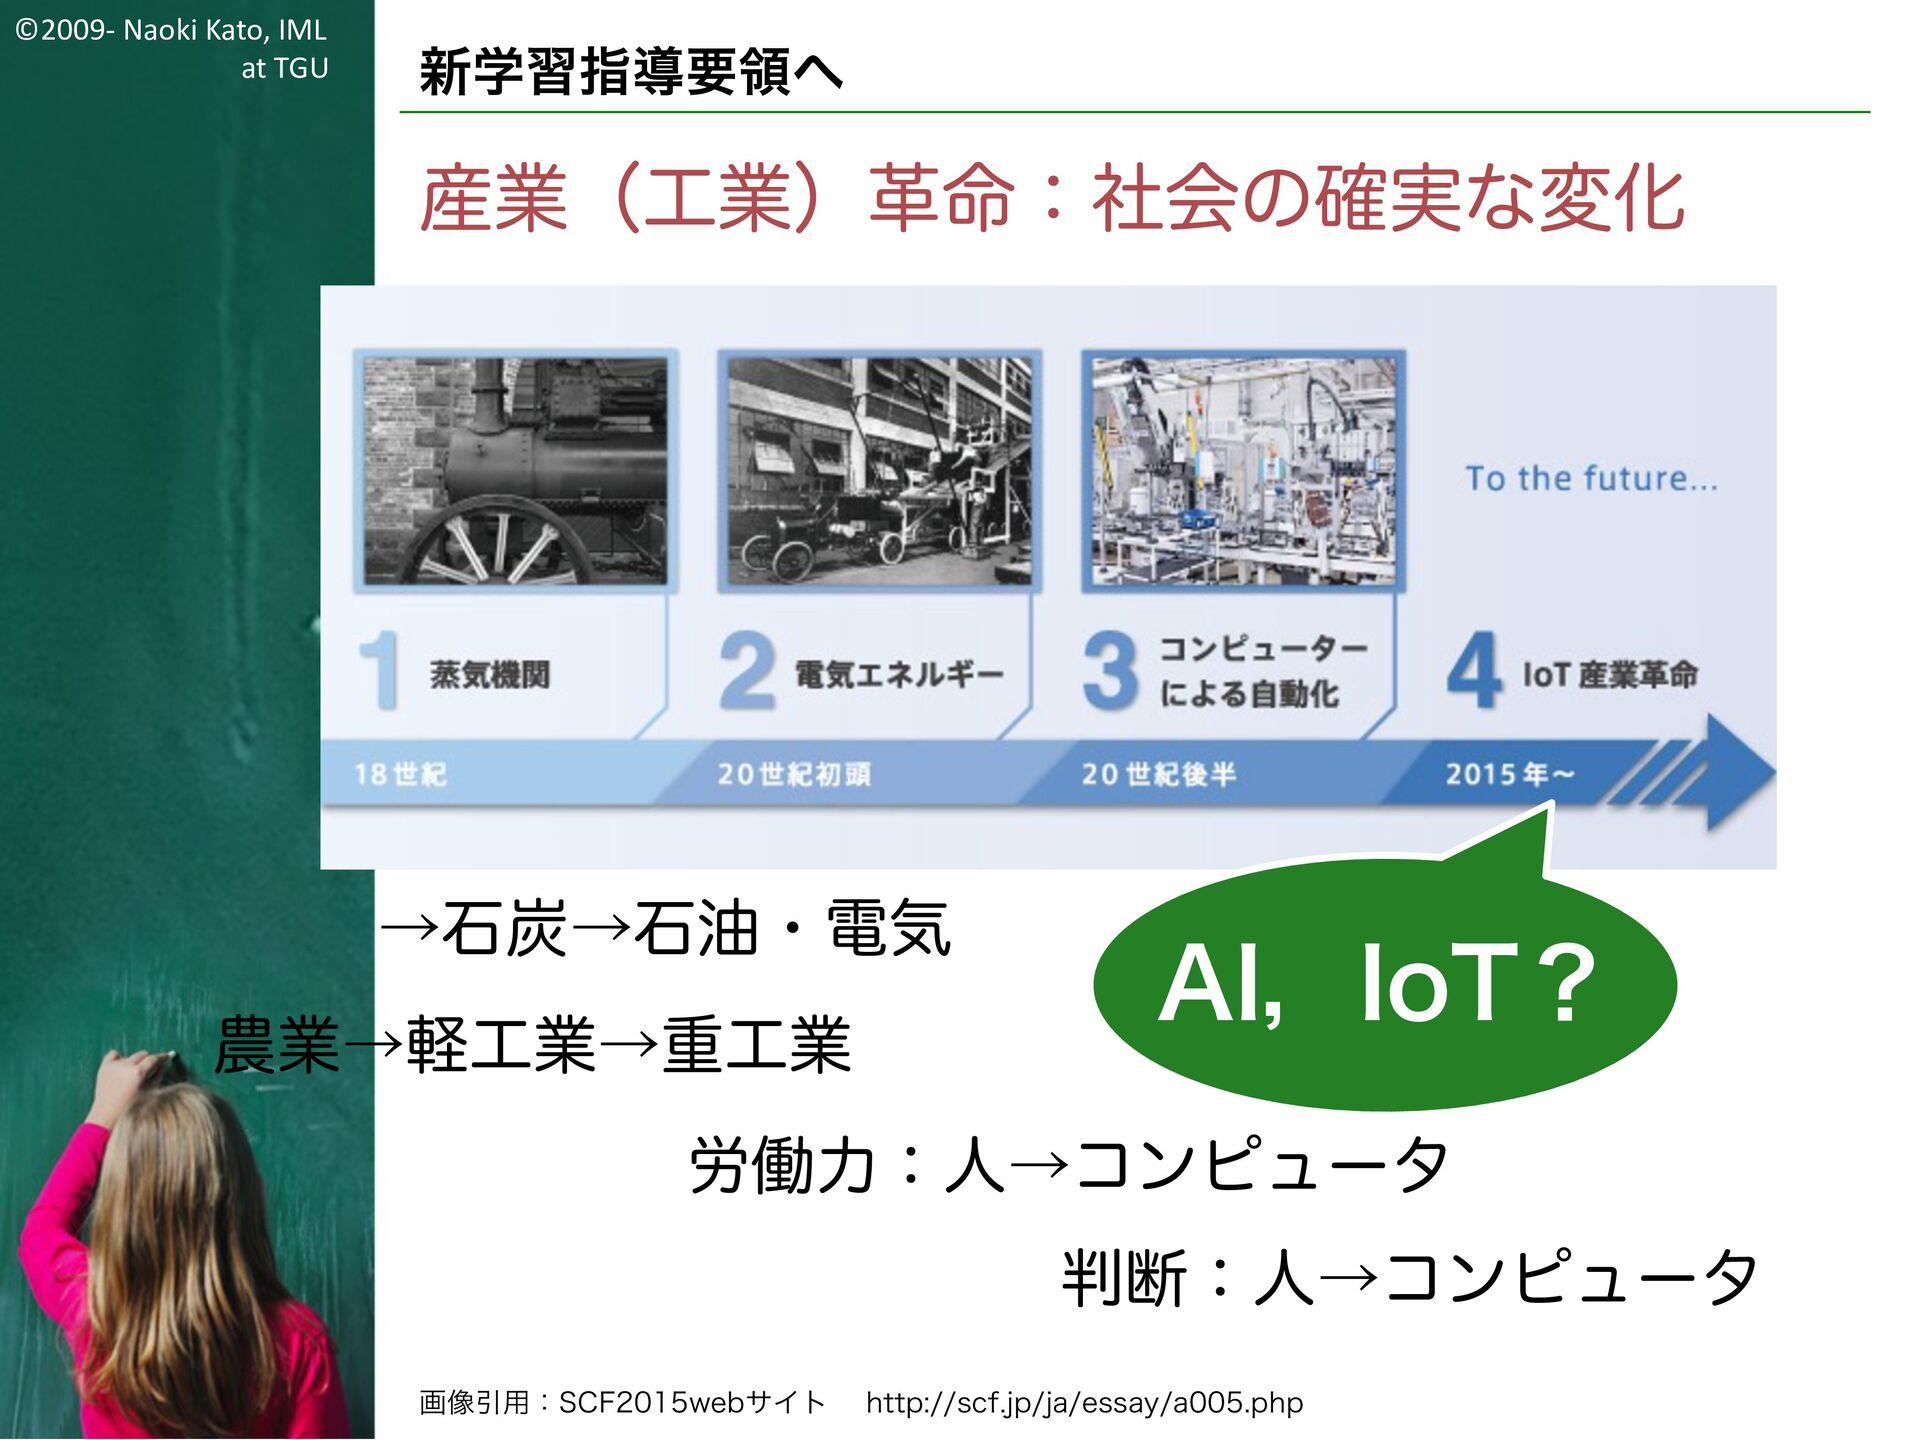 ©2009- Naoki Kato, IML at TGU 新学習指導要領へ